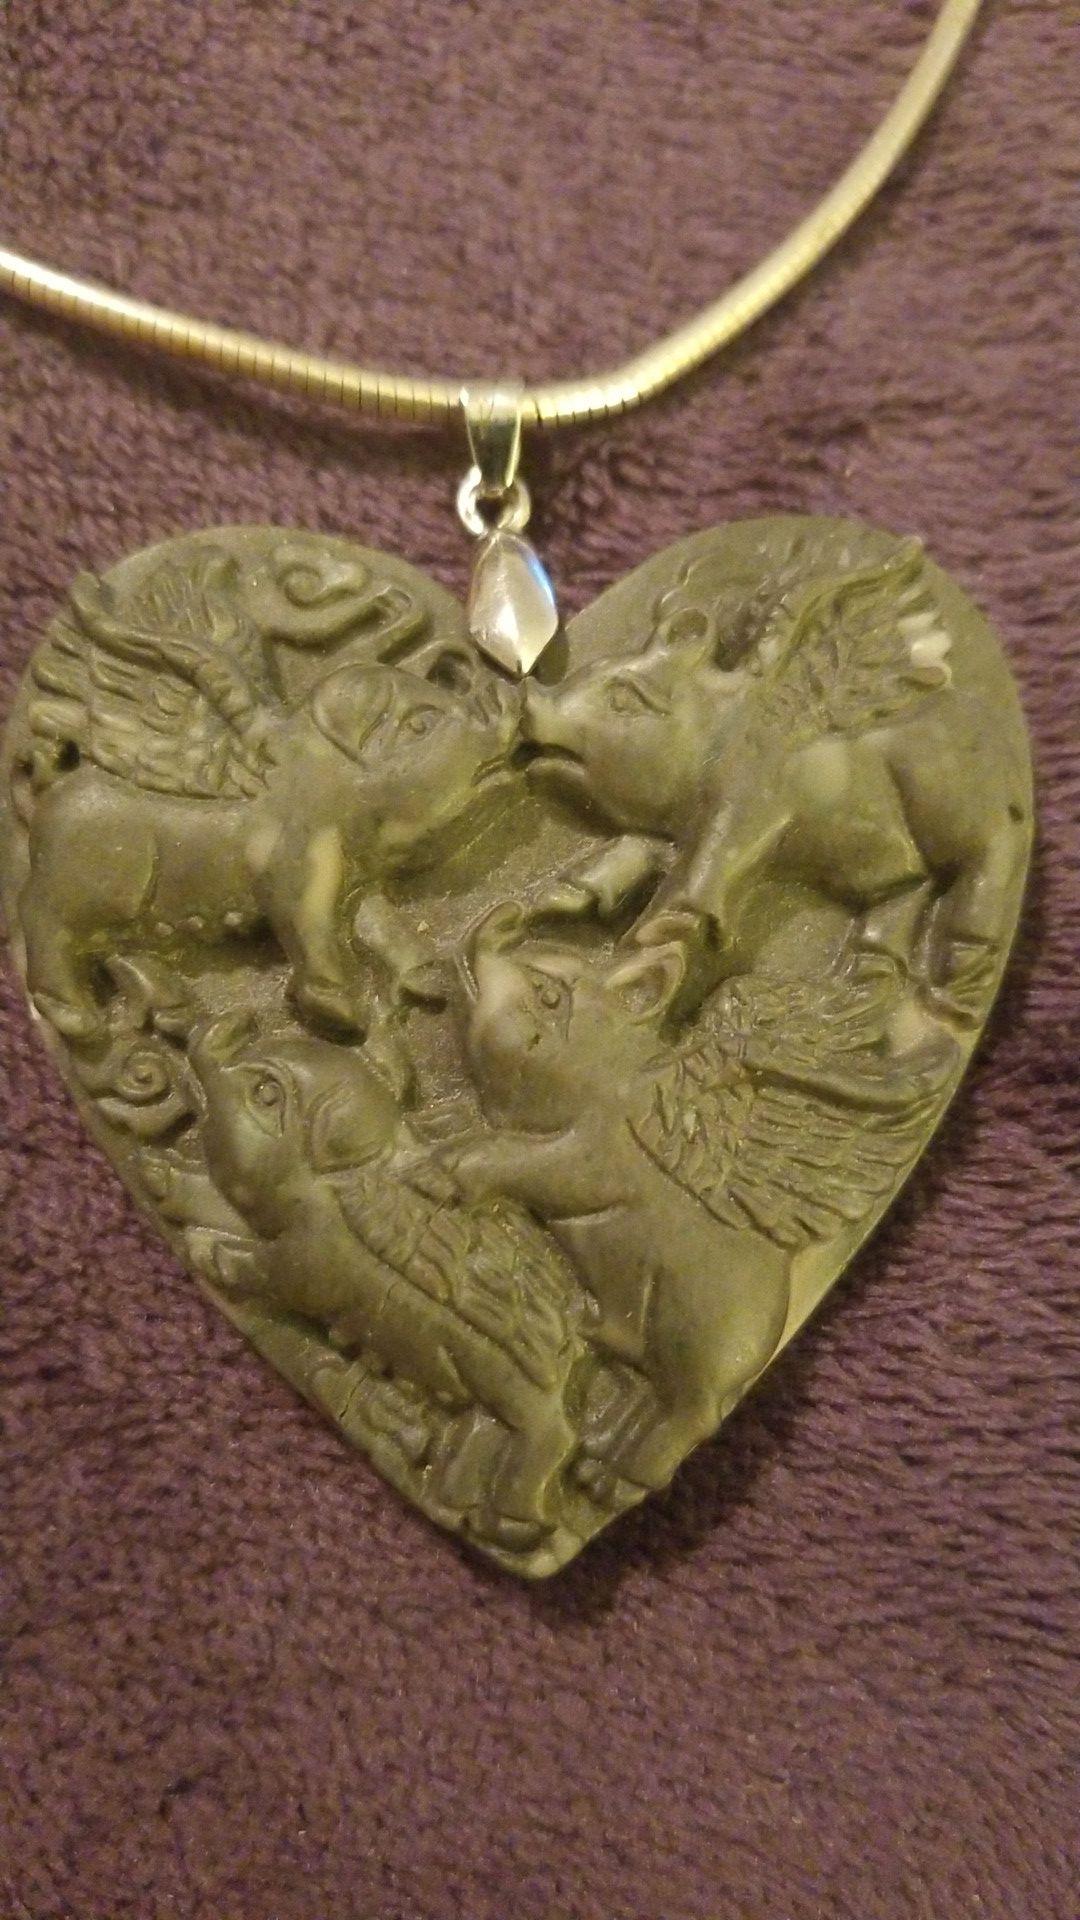 Huge stone flying pig pendant